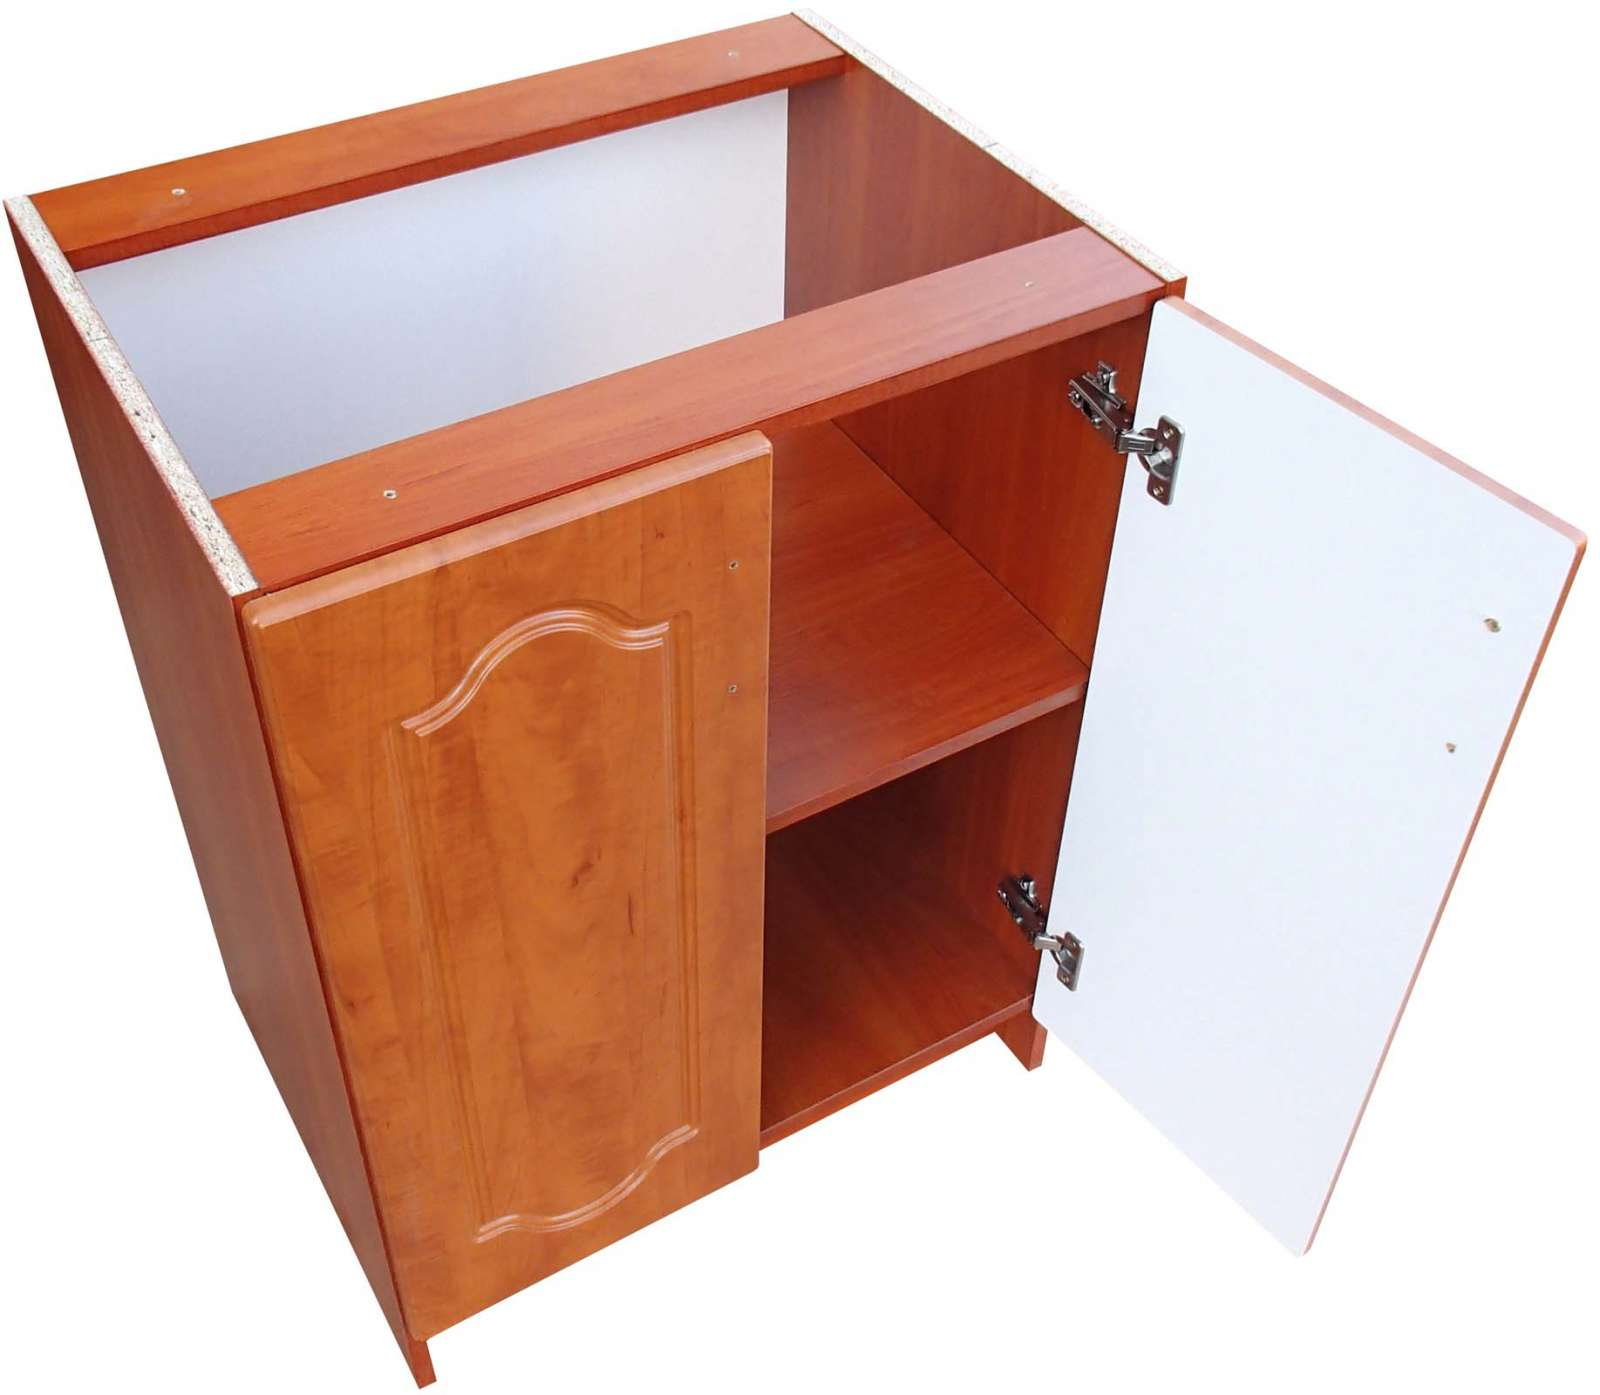 Kuchyňská skříňka spodní 2D 60 cm kalvádos